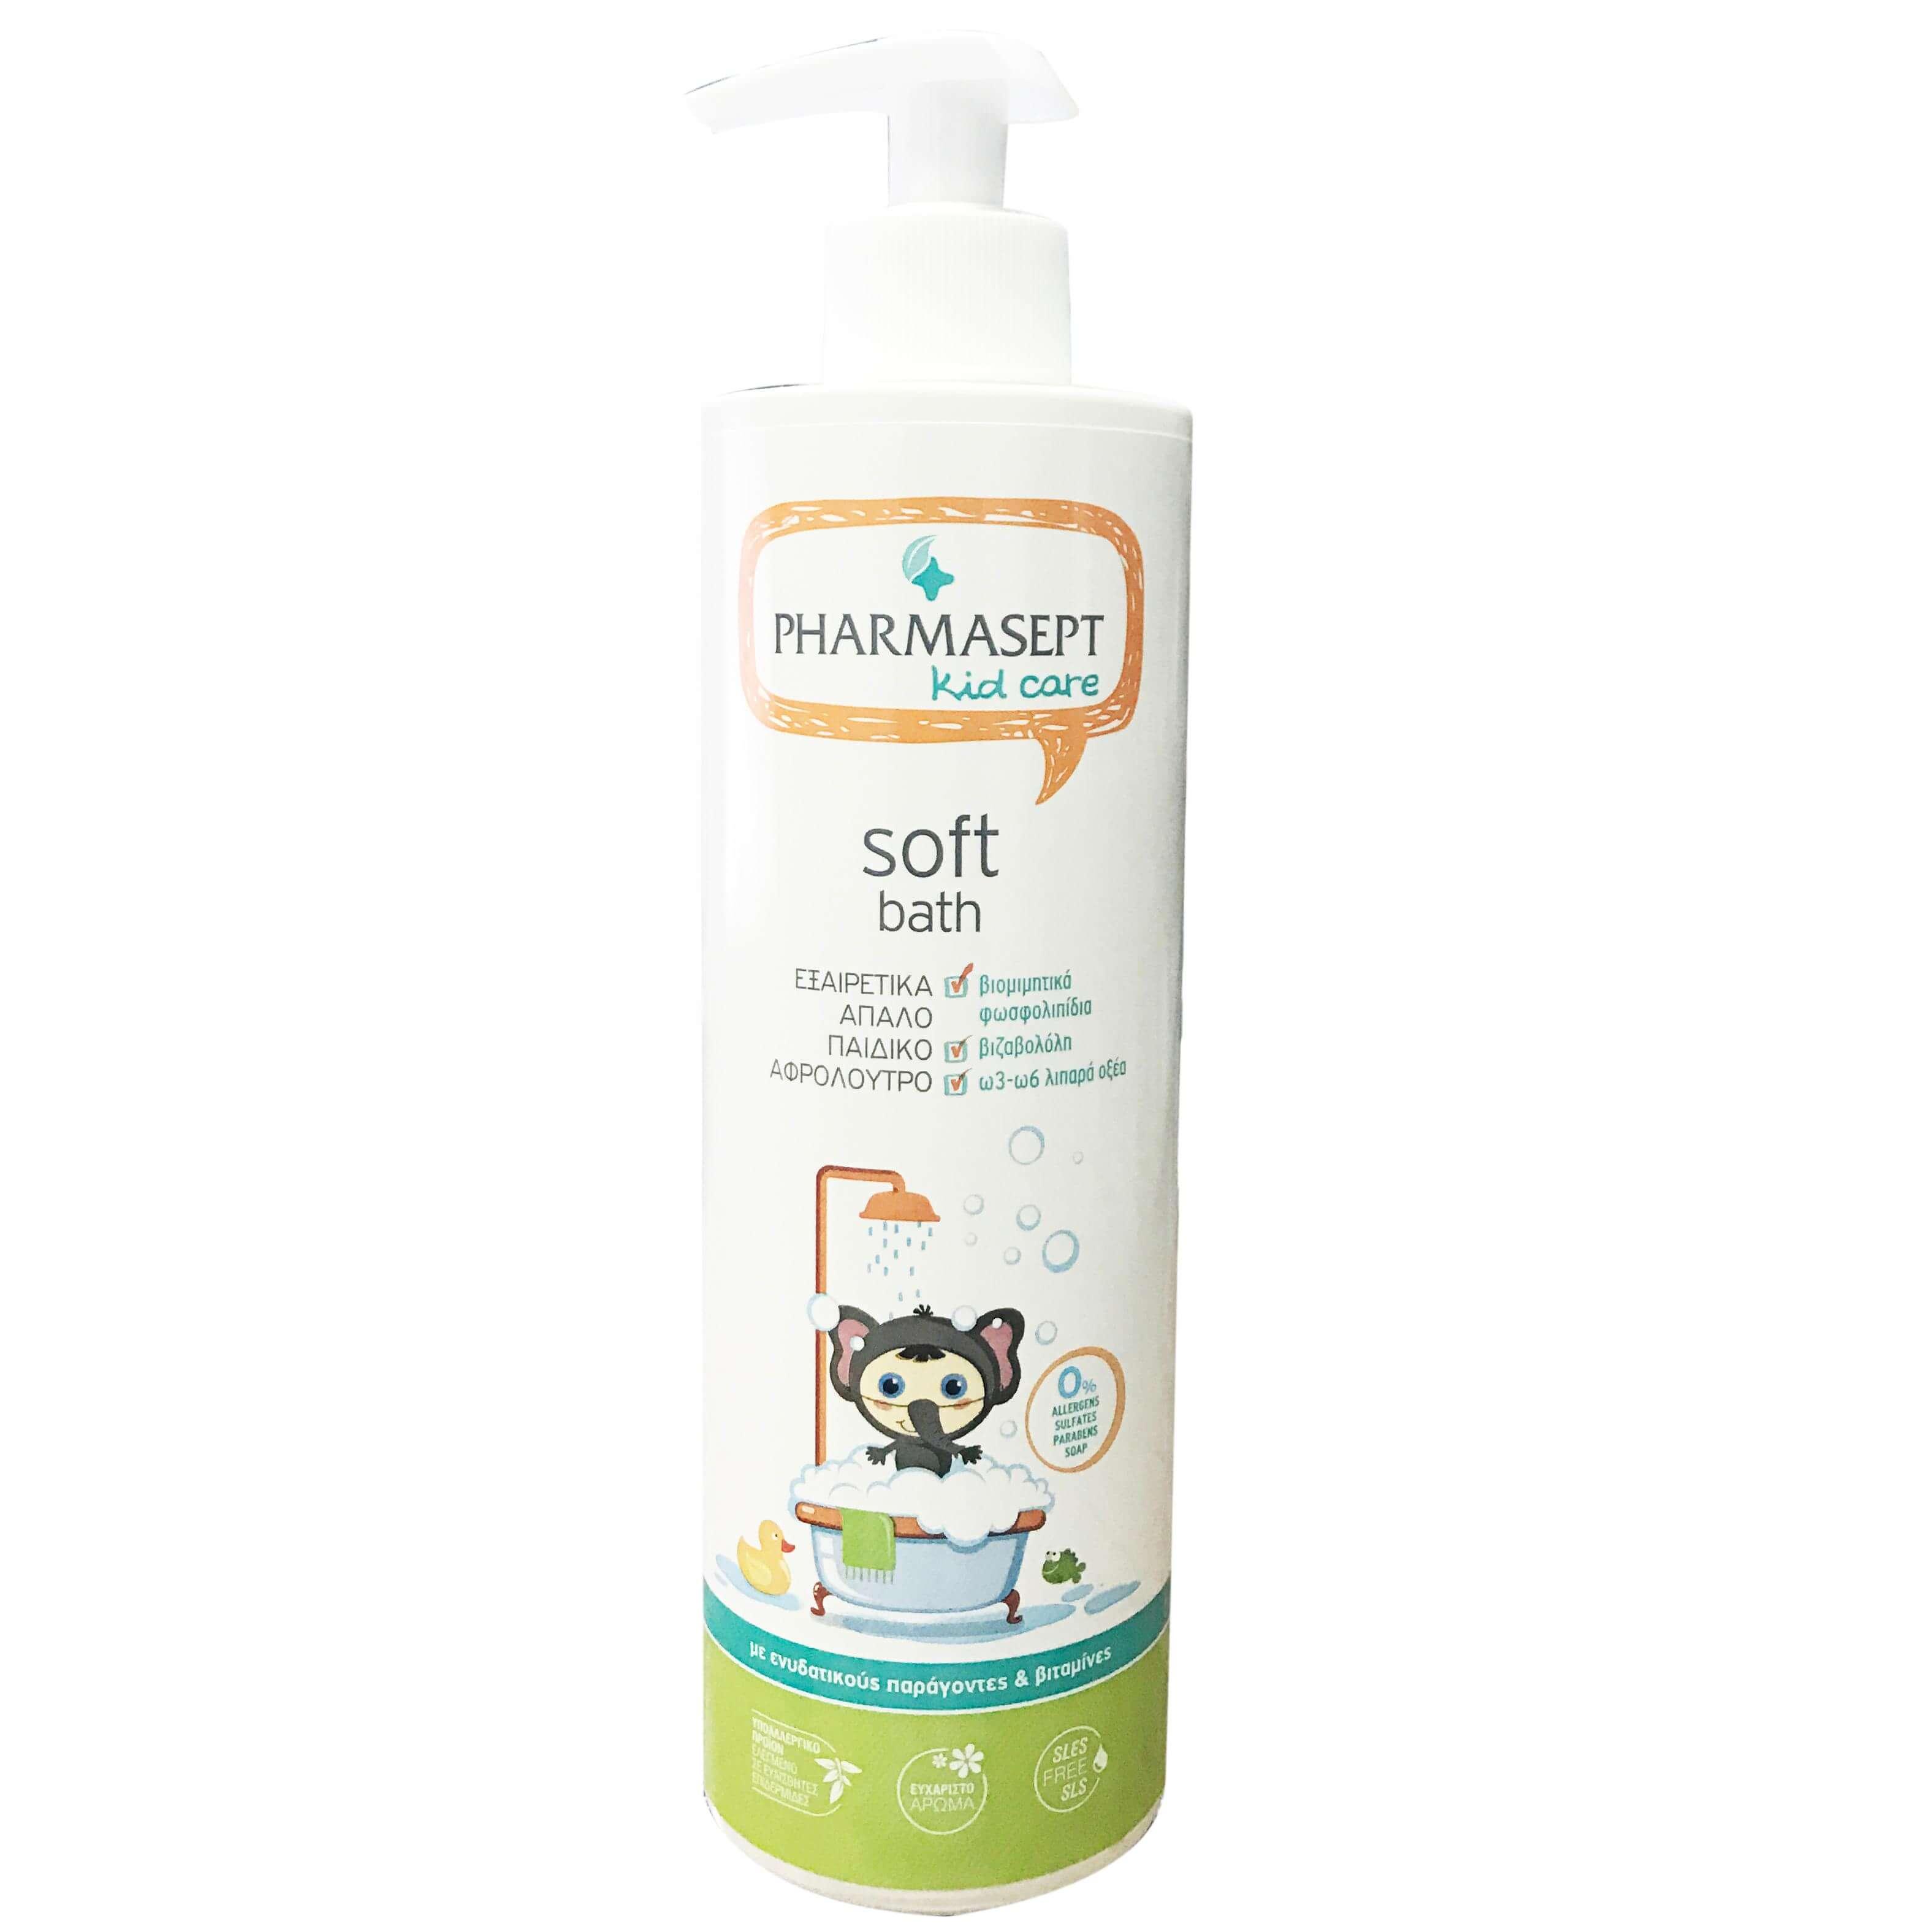 Pharmasept Kid Care Soft Bath Απαλό Υποαλλεργικό Αφρόλουτρο για την Ευαίσθητη Παιδική Επιδερμίδα500ml